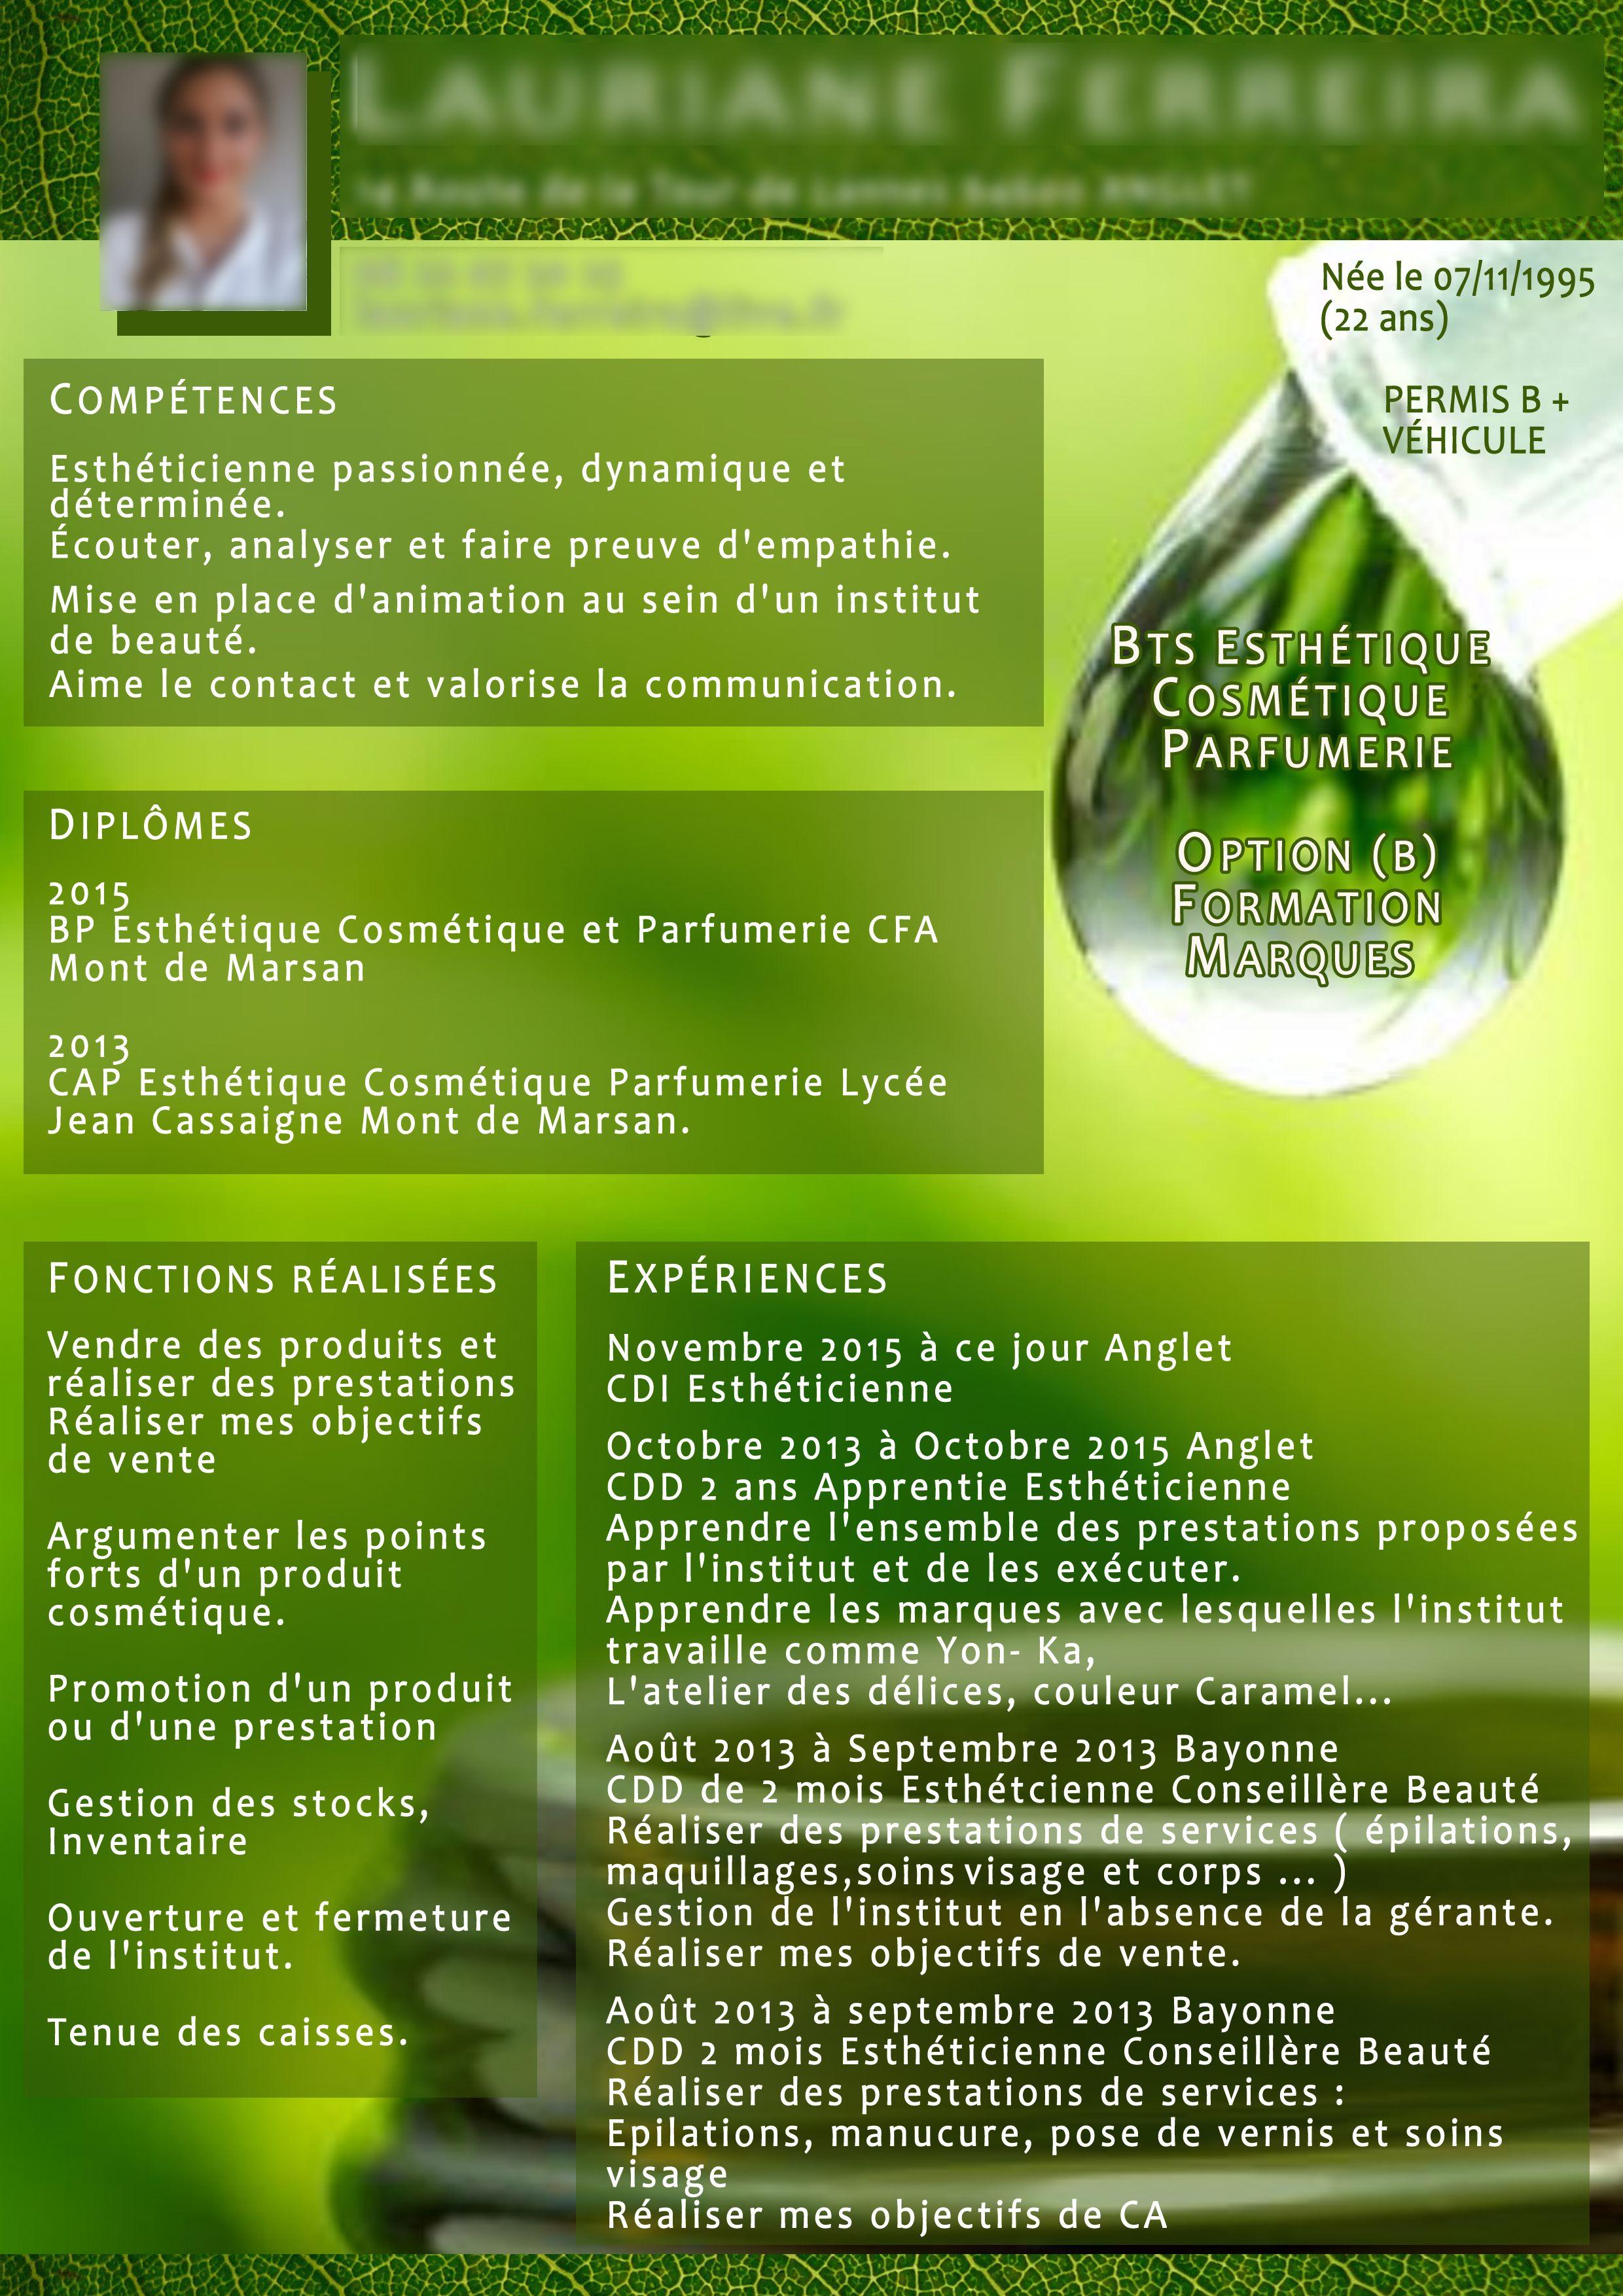 Creation Cv Bts Estheticienne Parapharmacie Creation Franck Laforest Free Invitation Cards Brochure Digital